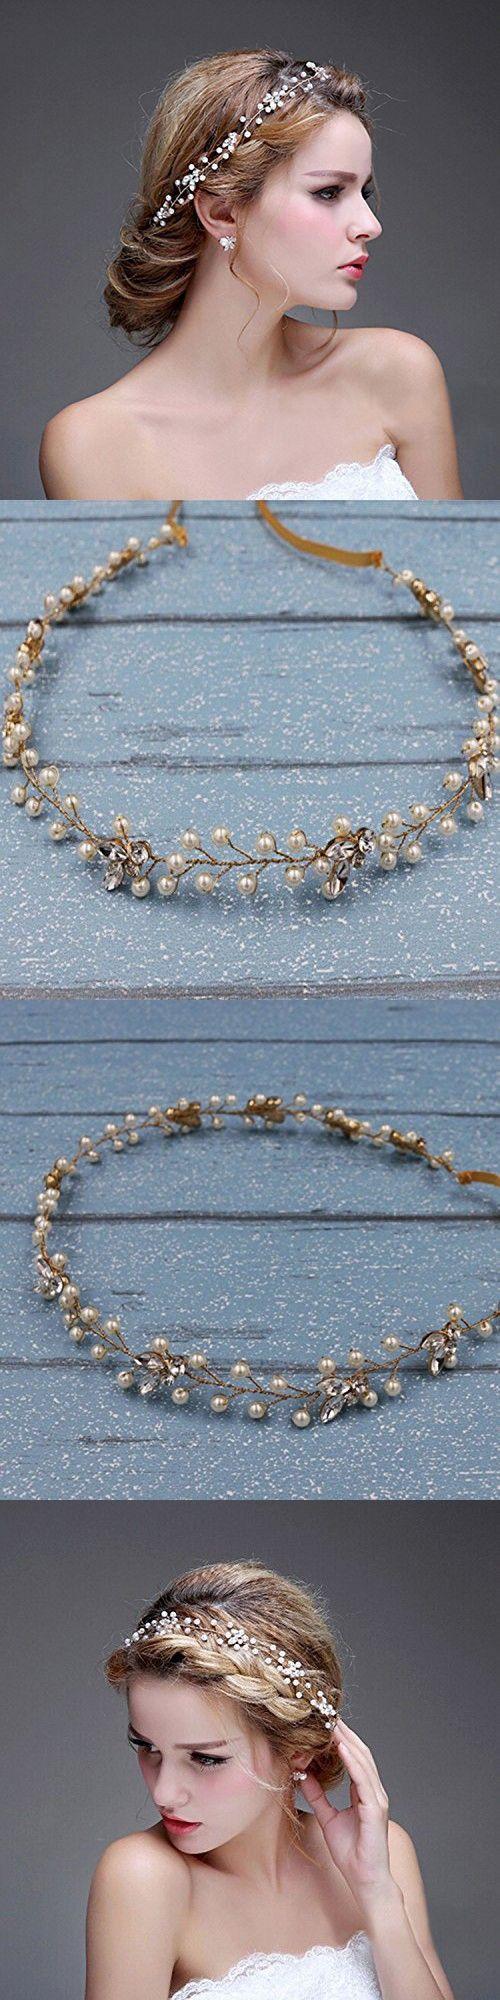 Bridalvenus Wedding Bridal Gold Headband - Bridal pearl halo - Bridal hair Updo accessory Wedding Bridesmaid Headpiece for Women and Girls (Gold)